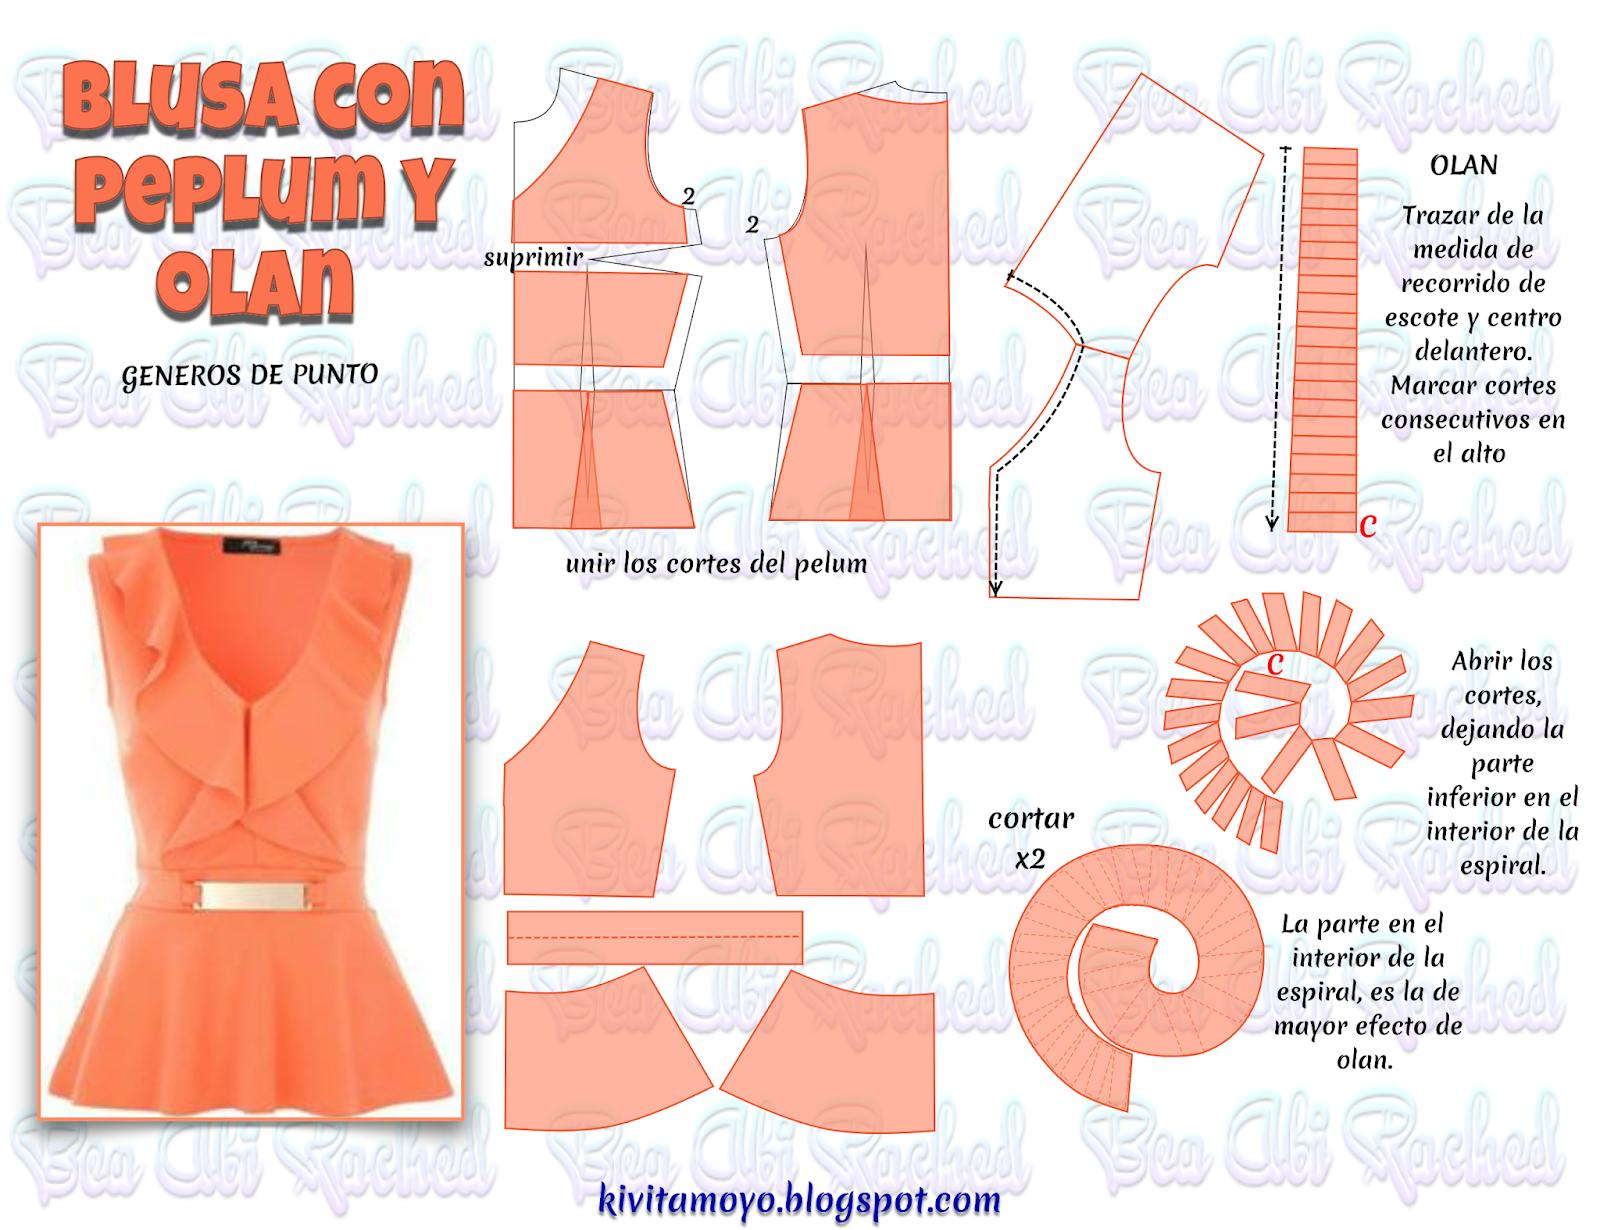 KiVita MoYo : BLUSA CON PEPLUM Y OLAN | Шиття | Pinterest | Costura ...